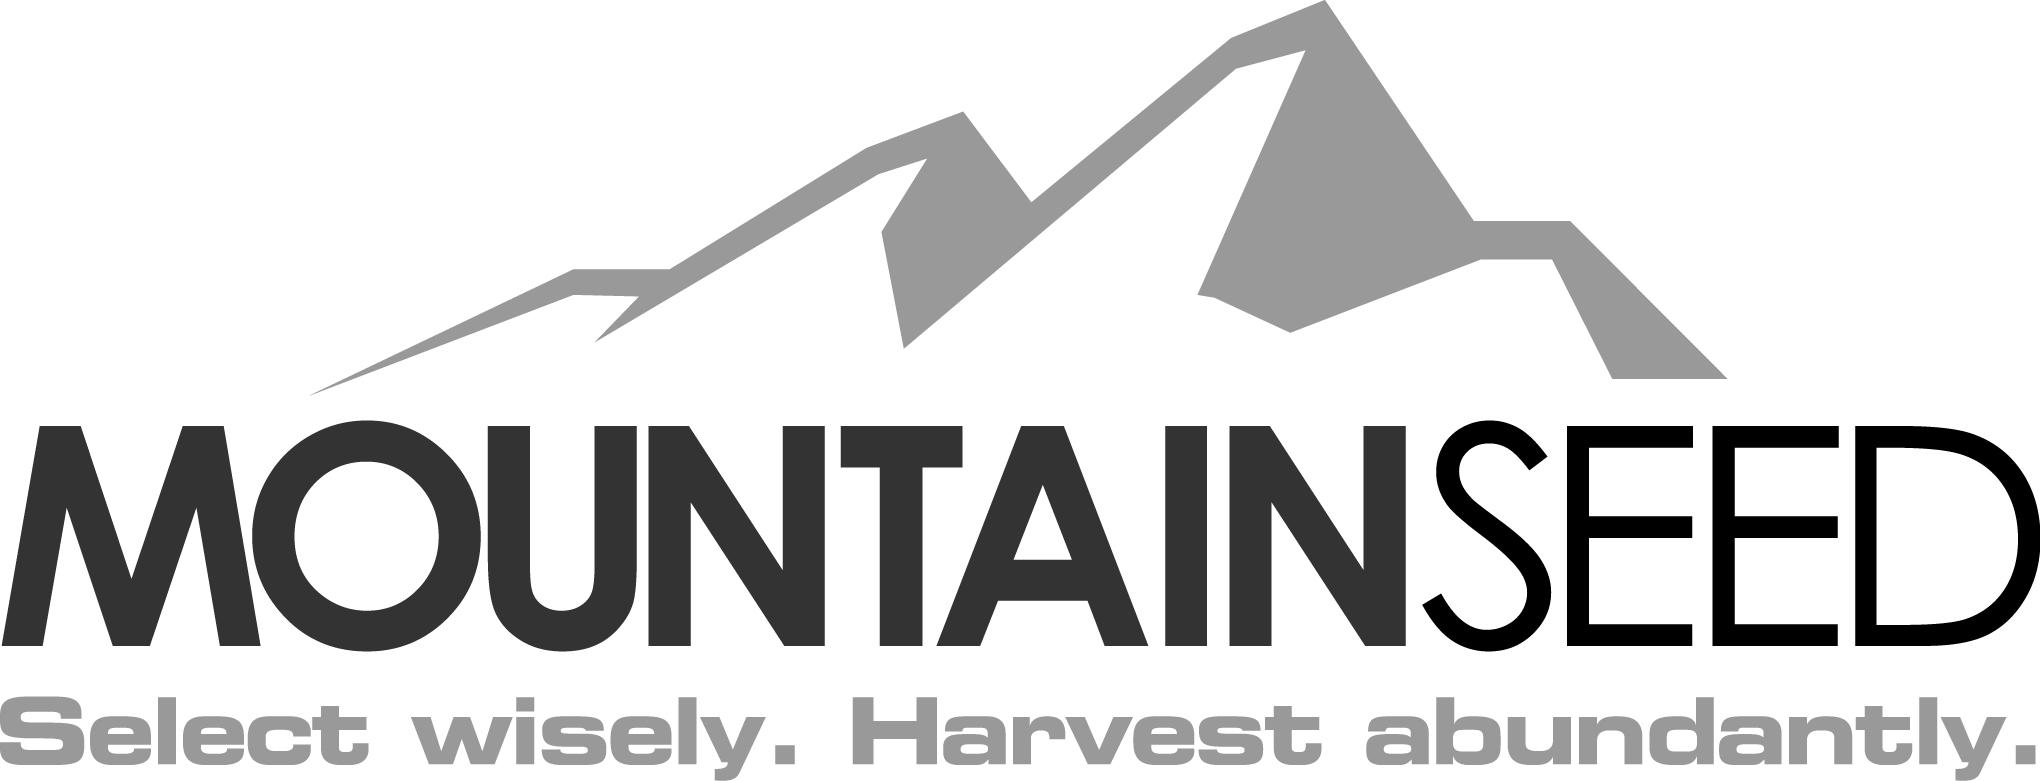 MountainSeed_Gray.jpg